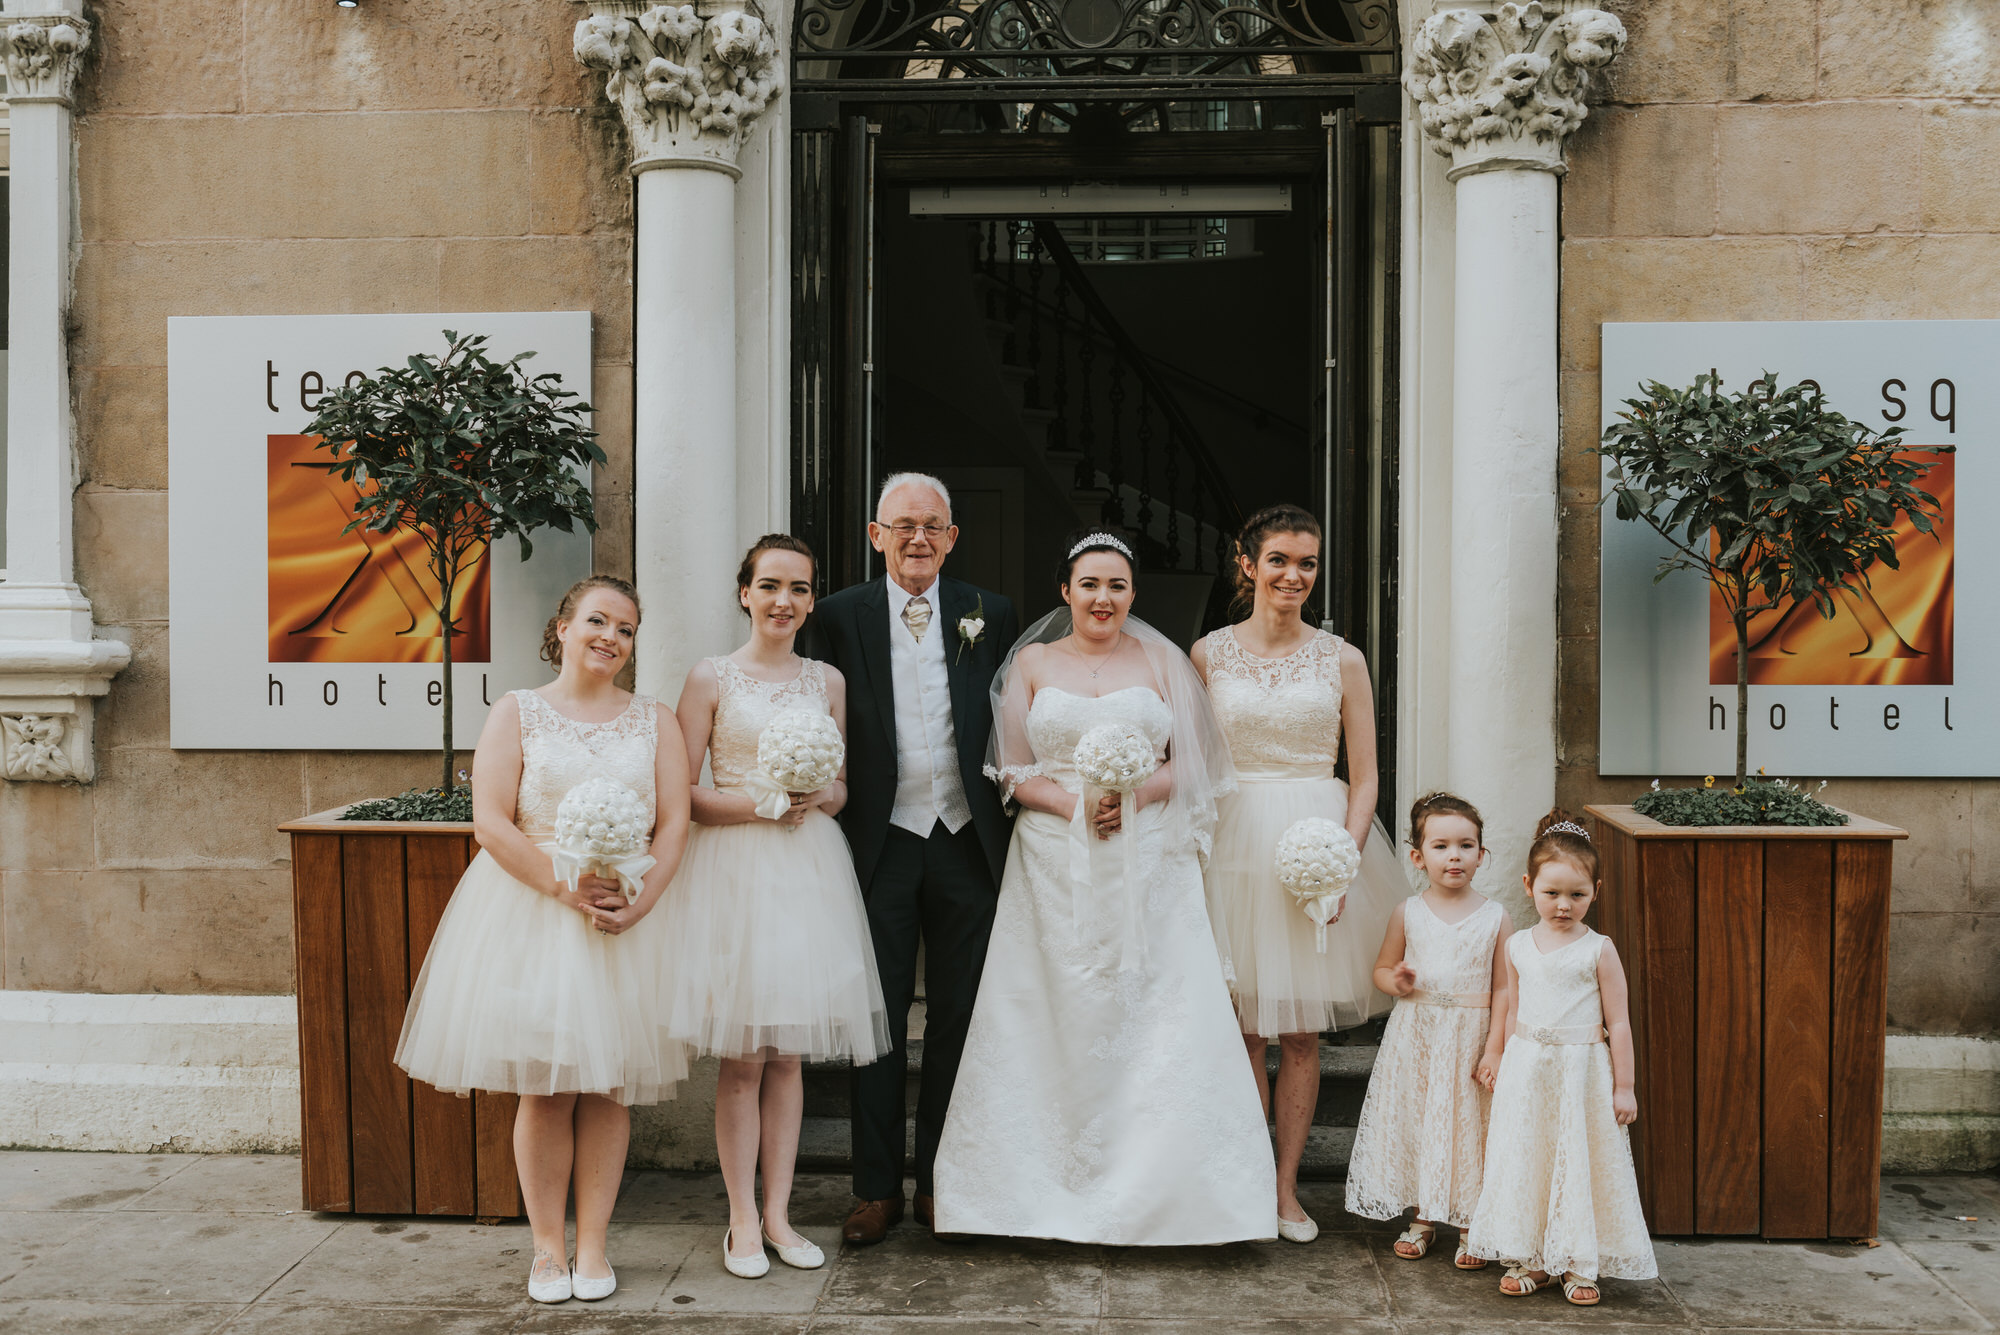 ten square hotel wedding ceremony belfast bride bridesmaids flower girls